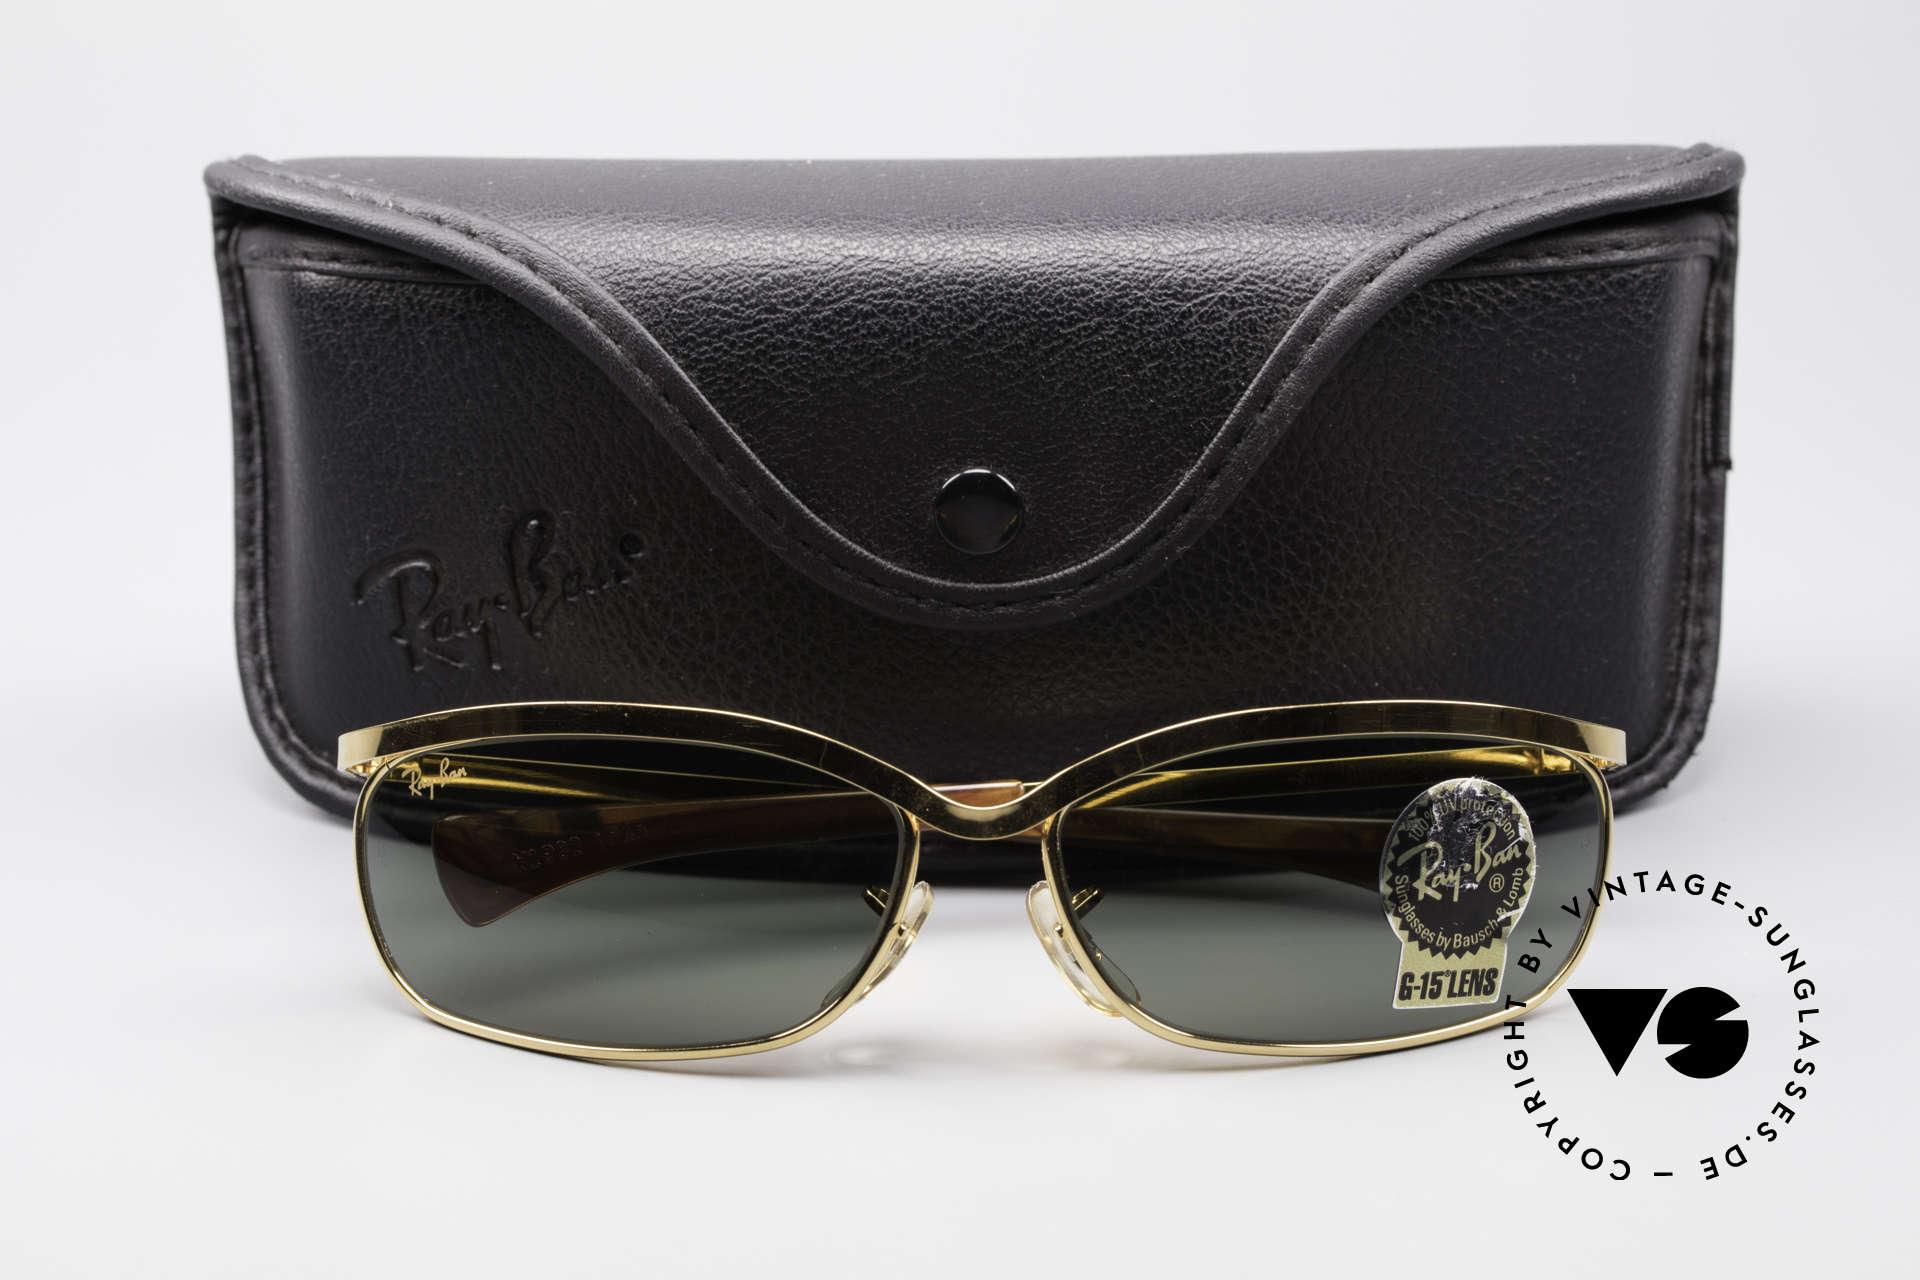 f799cfd8754 Sunglasses Ray Ban Olympian VI Deluxe B L USA Vintage Shades ...